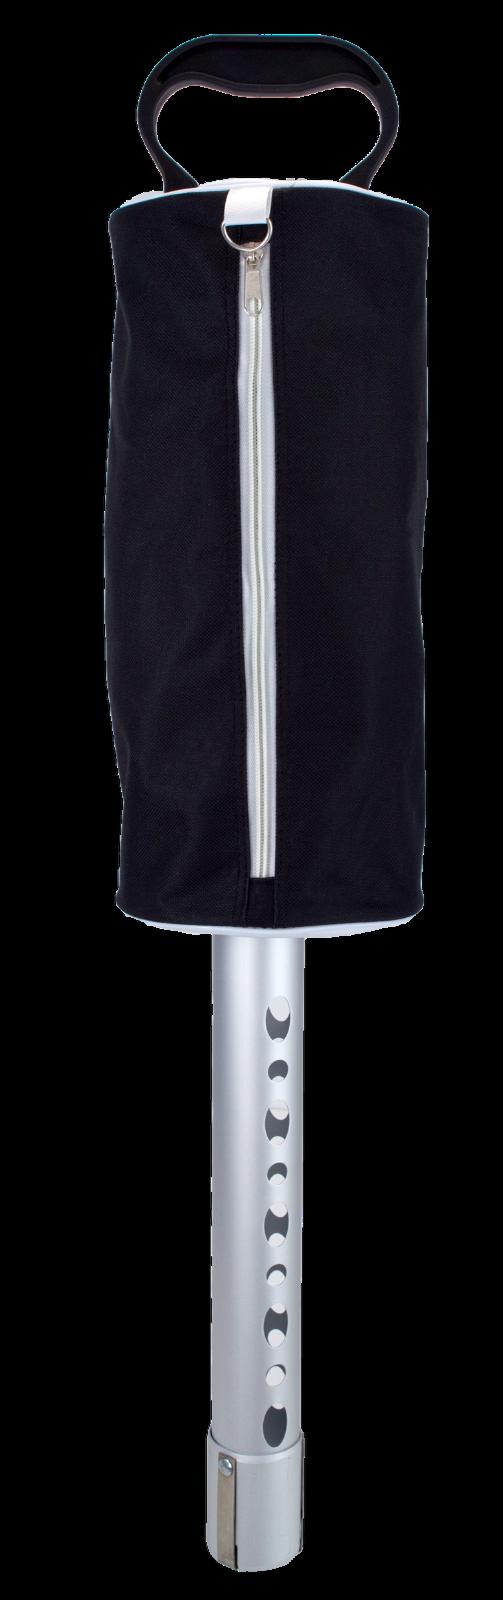 ProActive Sports Golf Ball Shag Bag with Aluminum Tube & Zip